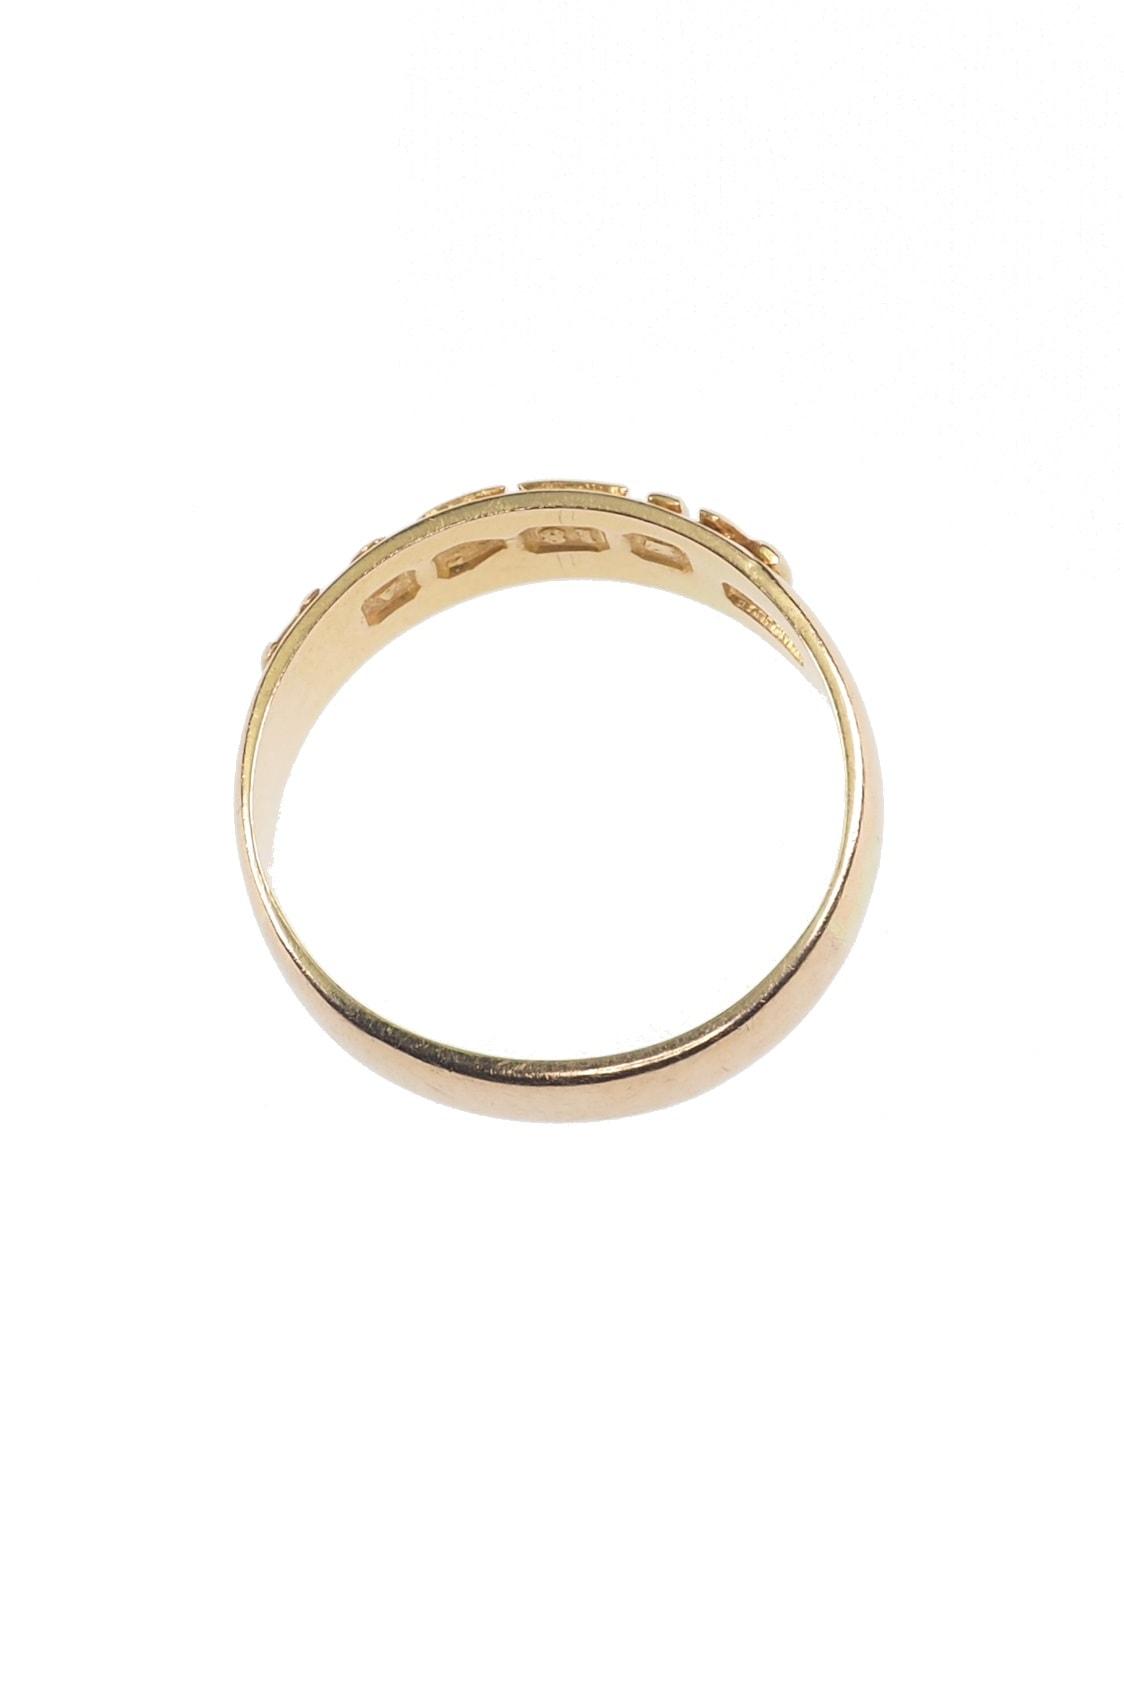 antike-Goldringe-online-kaufen-0225b